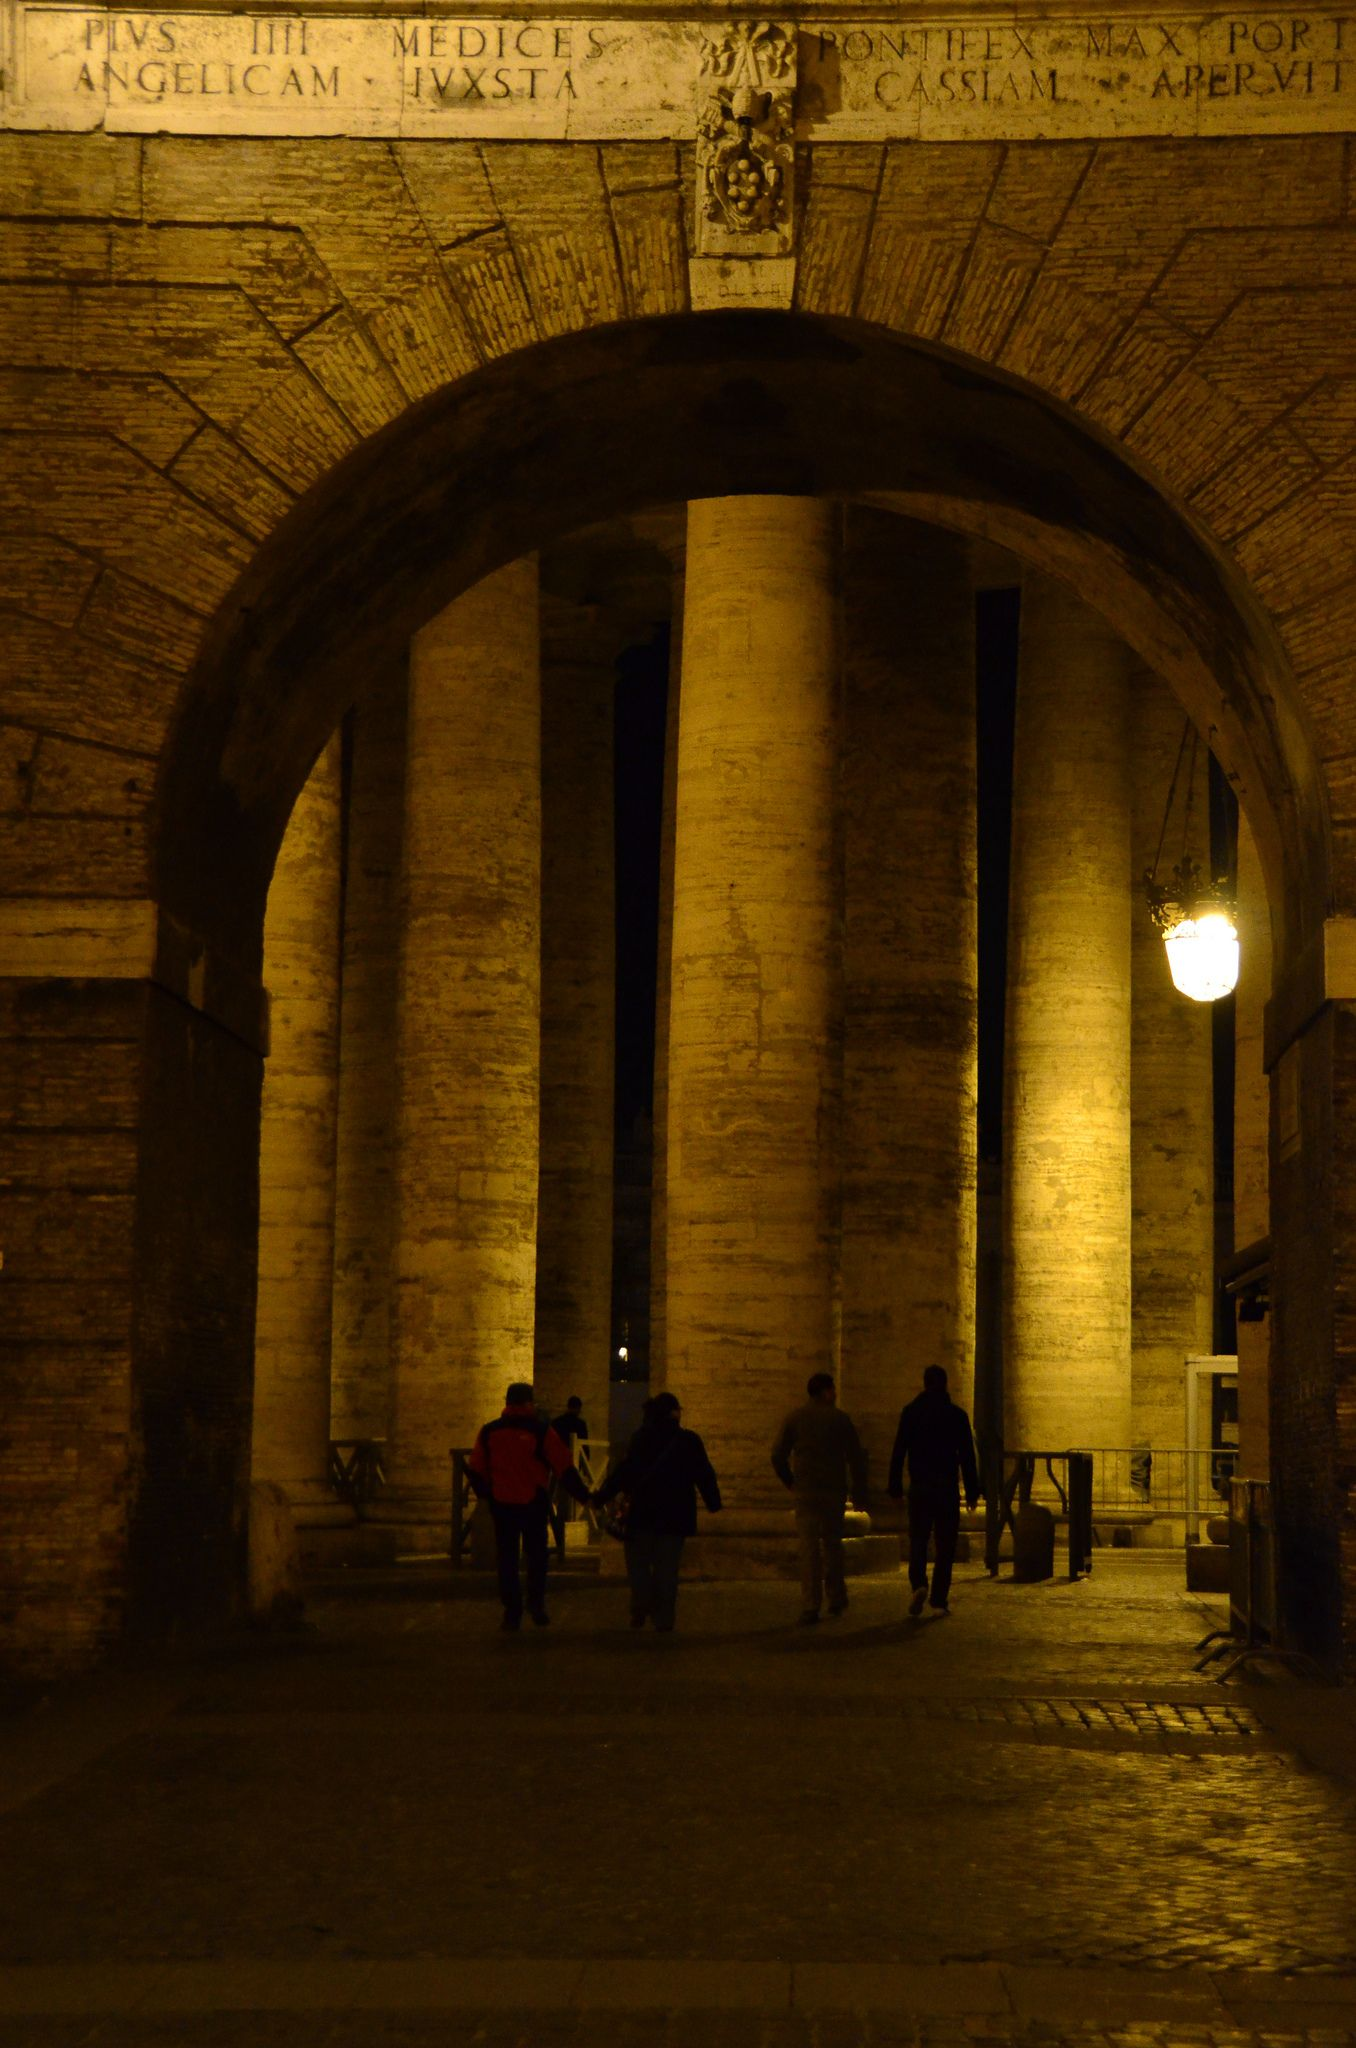 Heading Through Porta Angelica